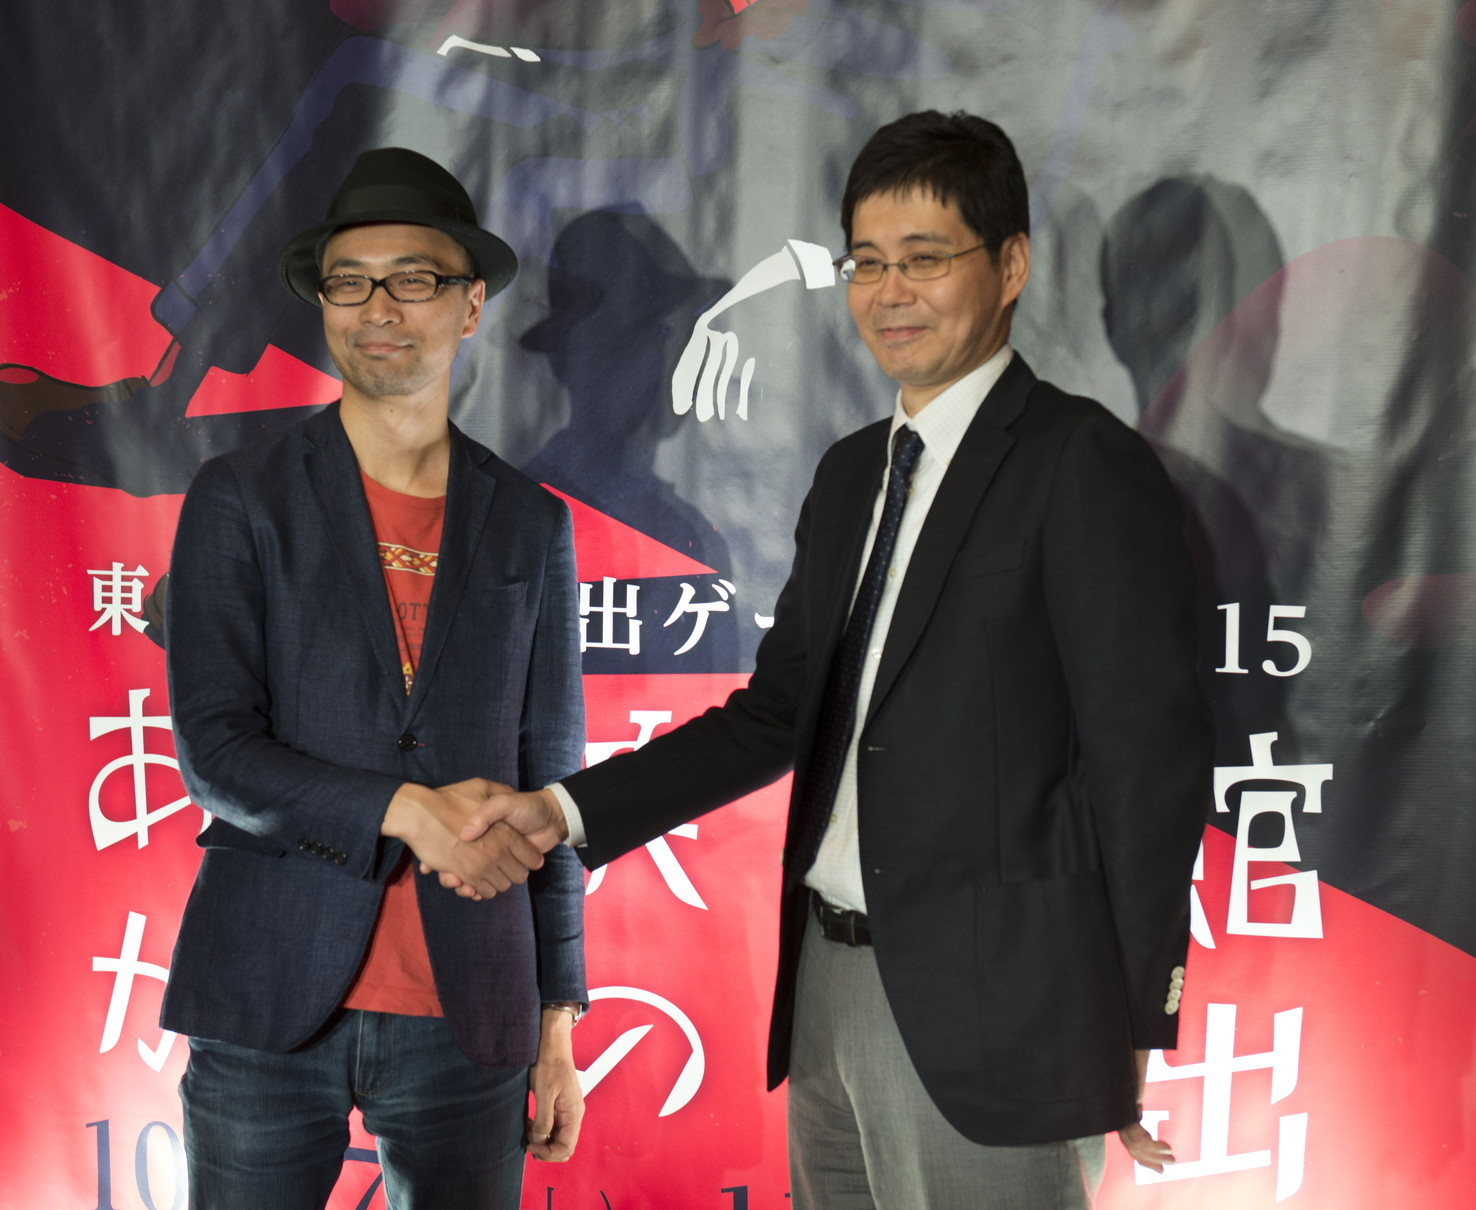 SCRAP代表 加藤隆生氏、松竹マルチプレックスシアターズ 経営企画部部長 井川甲作氏